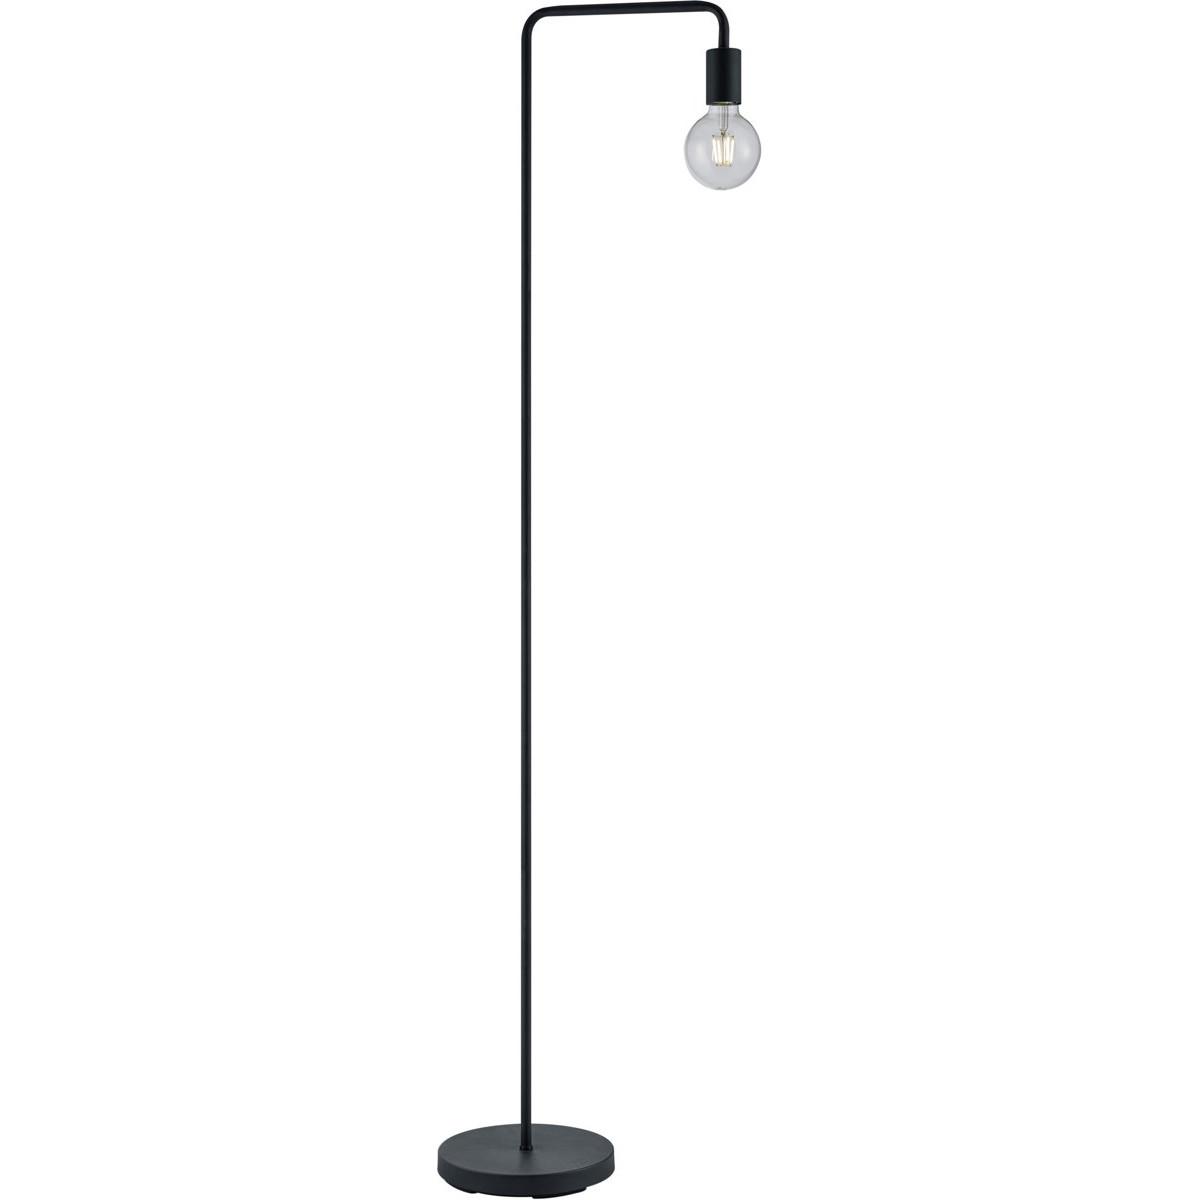 LED Vloerlamp - Trion Dolla - E27 Fitting - 1-lichts - Rond - Mat Zwart - Aluminium